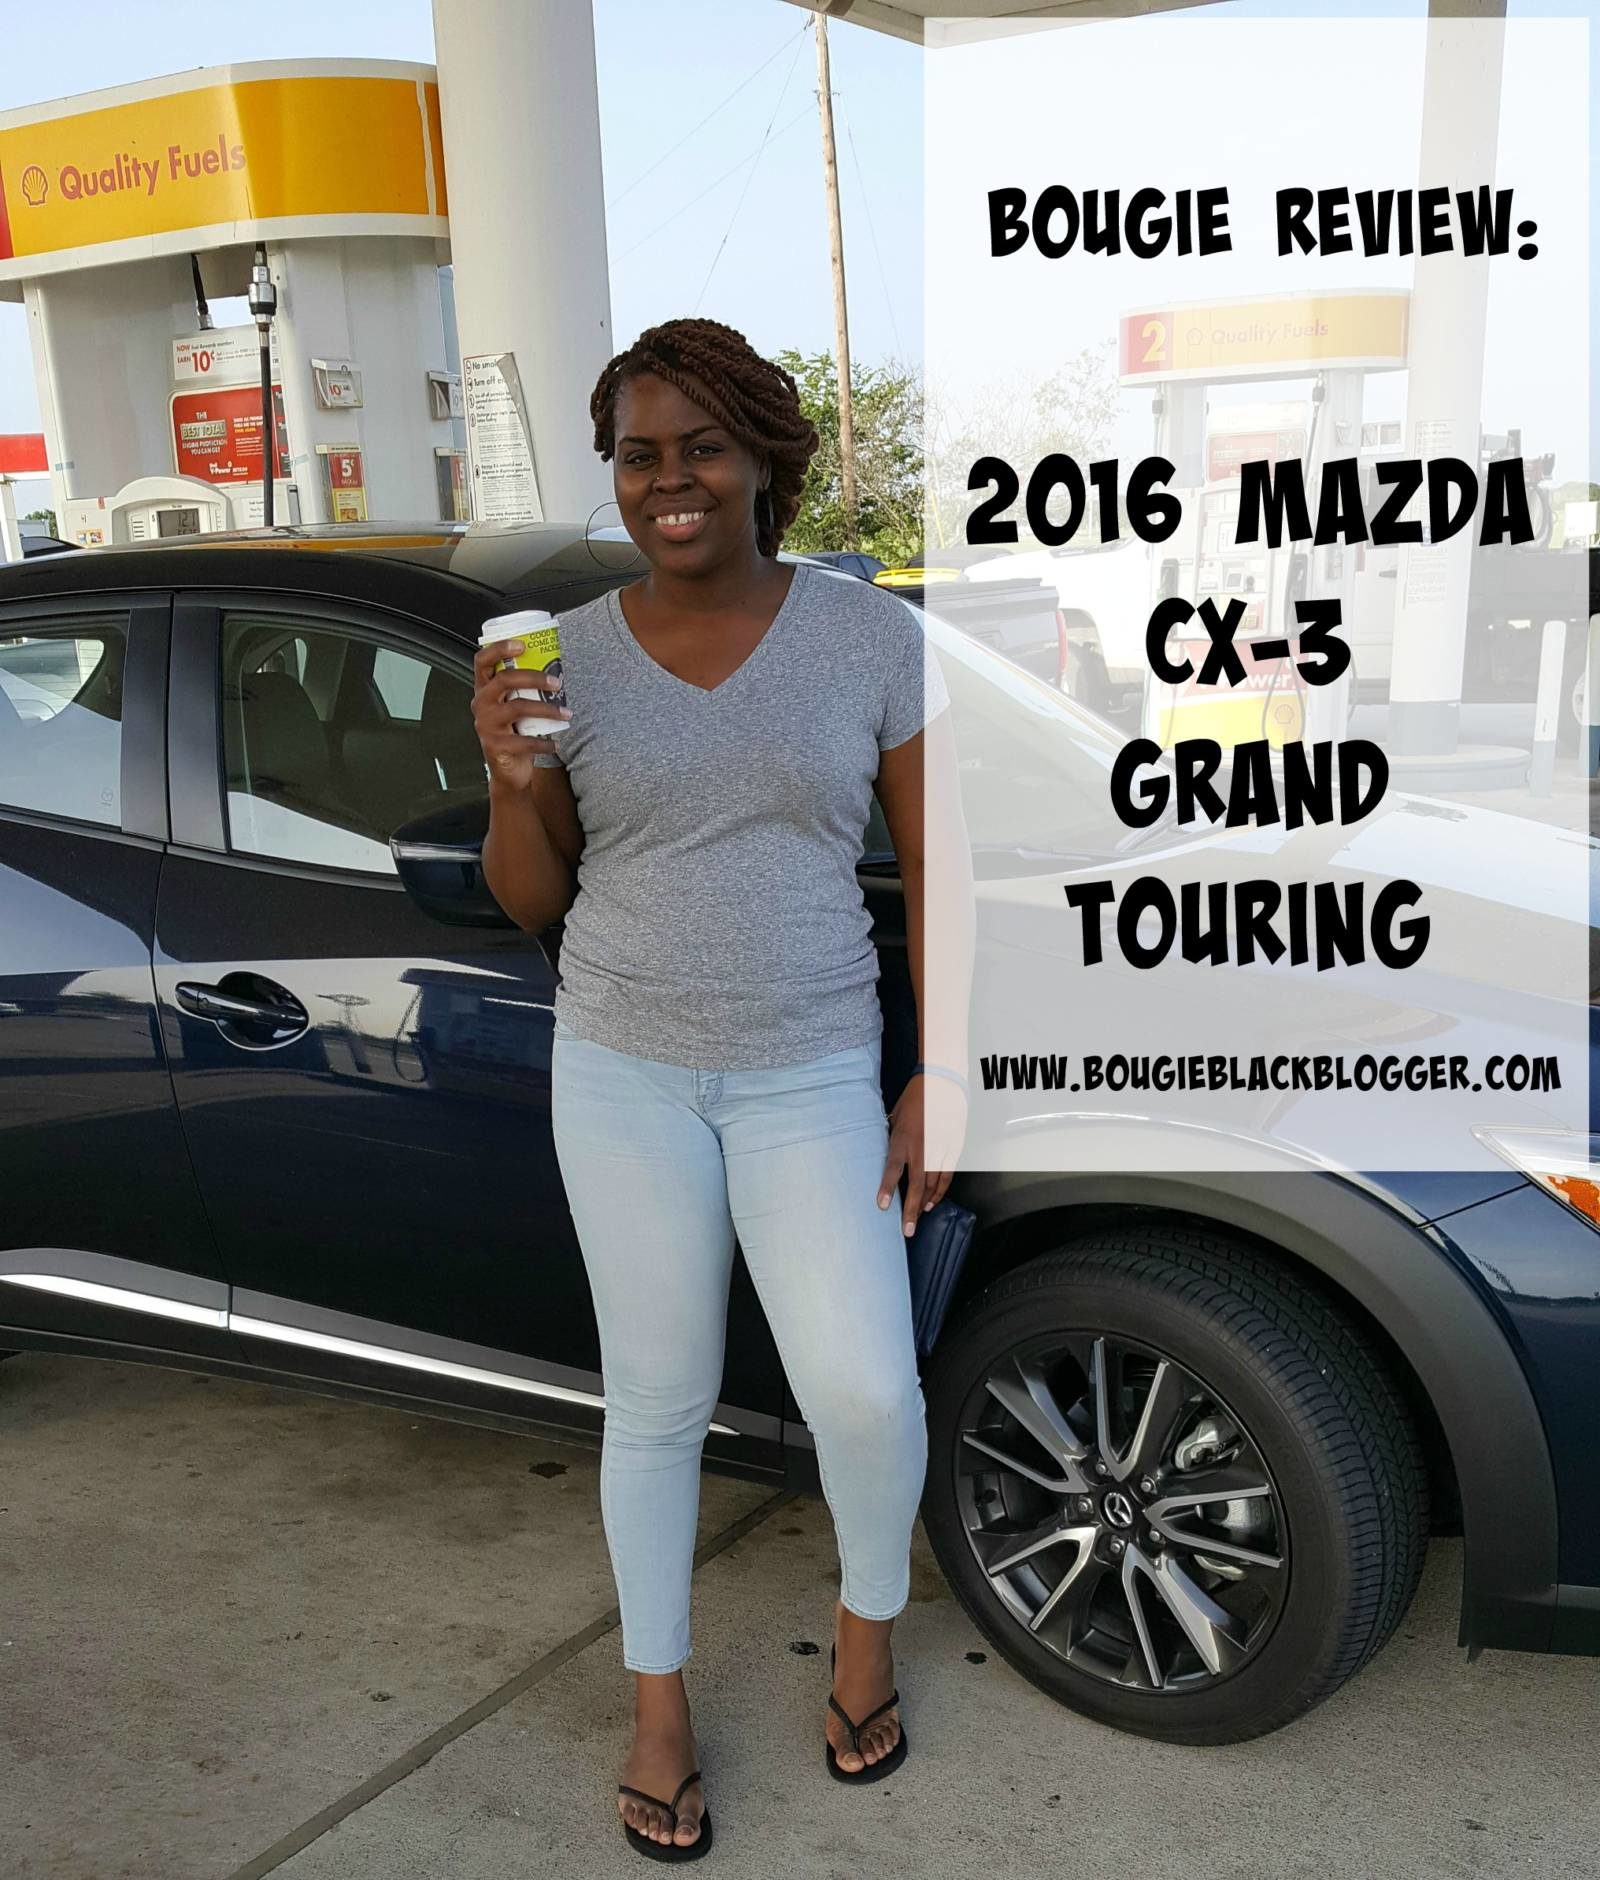 Roadtrip to Houston in the 2016 Mazda CX-3 Grand Touring